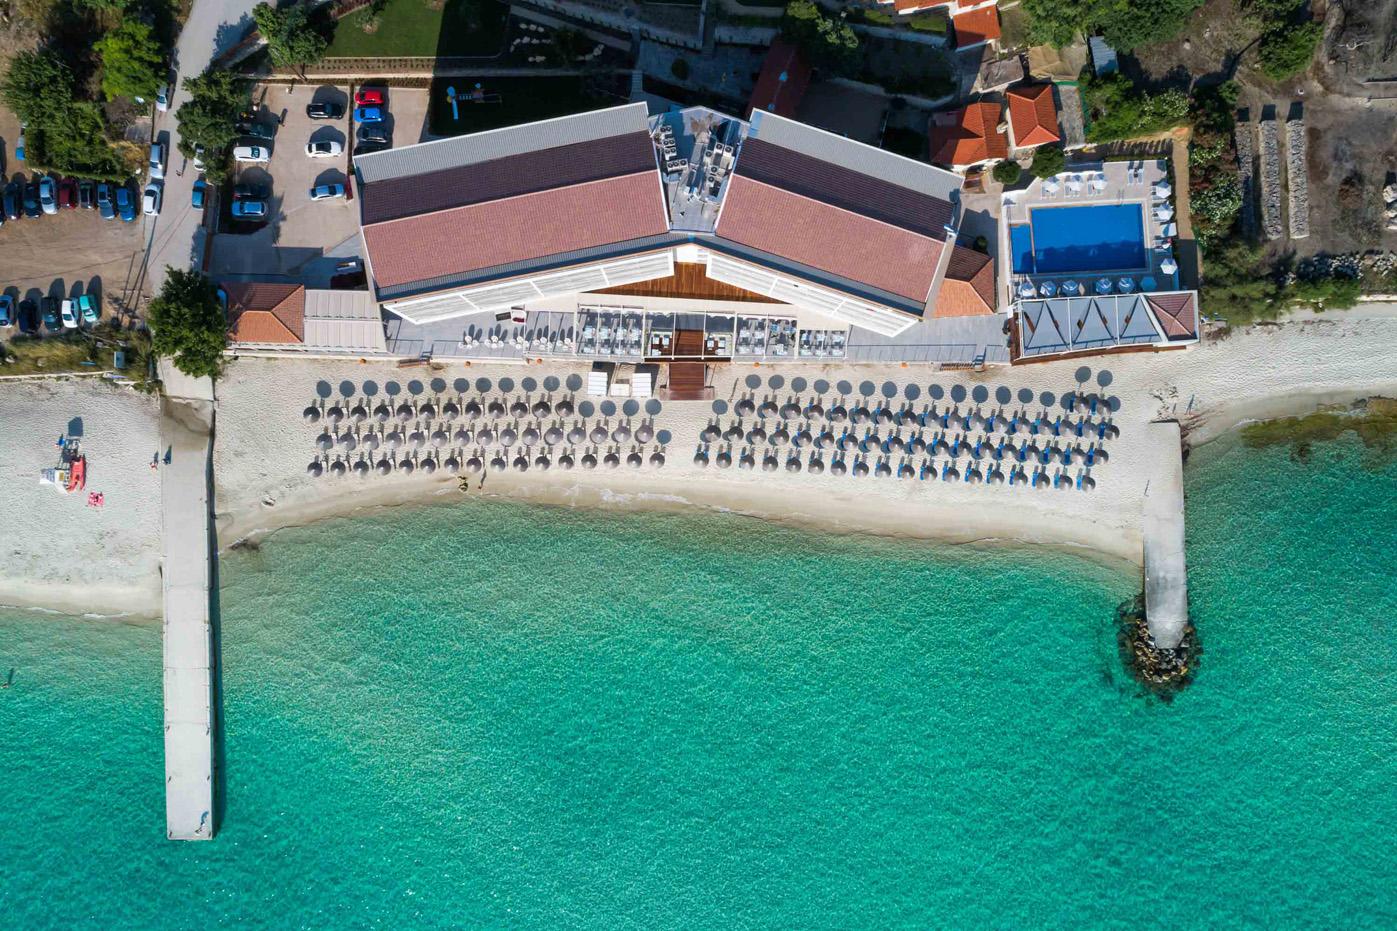 Grcka hoteli letovanje, Halkidiki, Kalithea,Ammon Zeus plaža